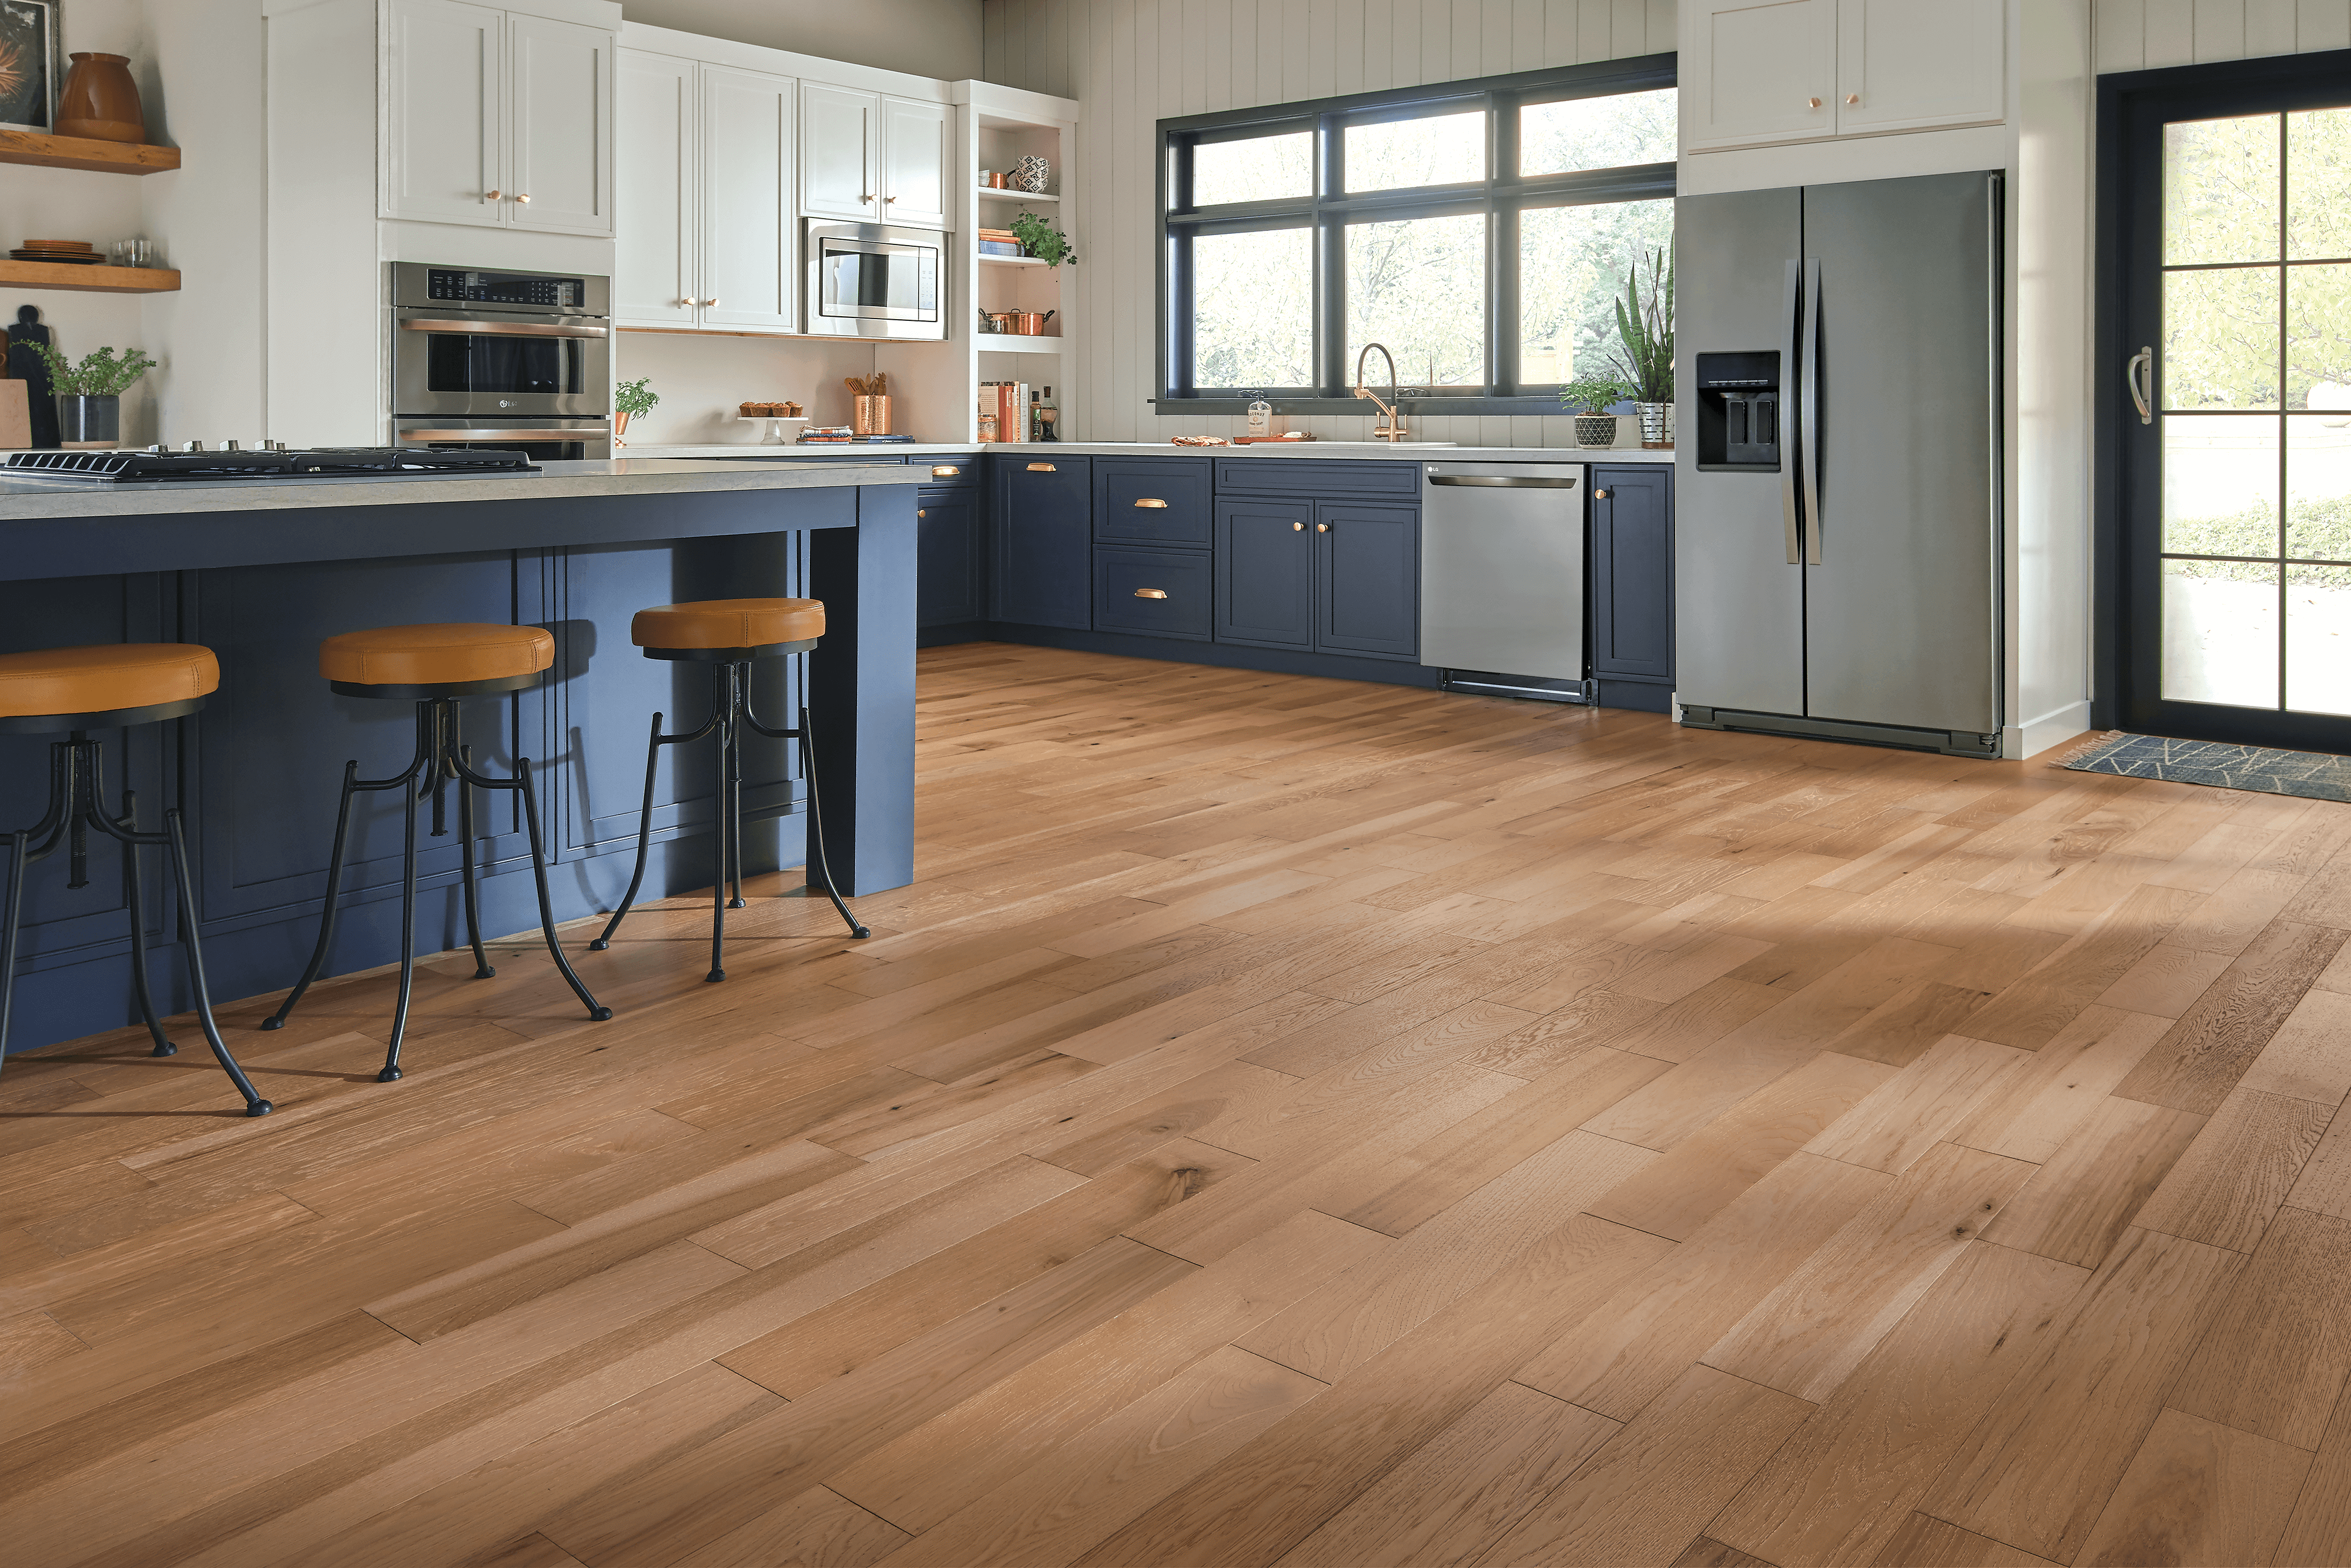 Hardwood Flooring Room Inspiration Guide | Bruce